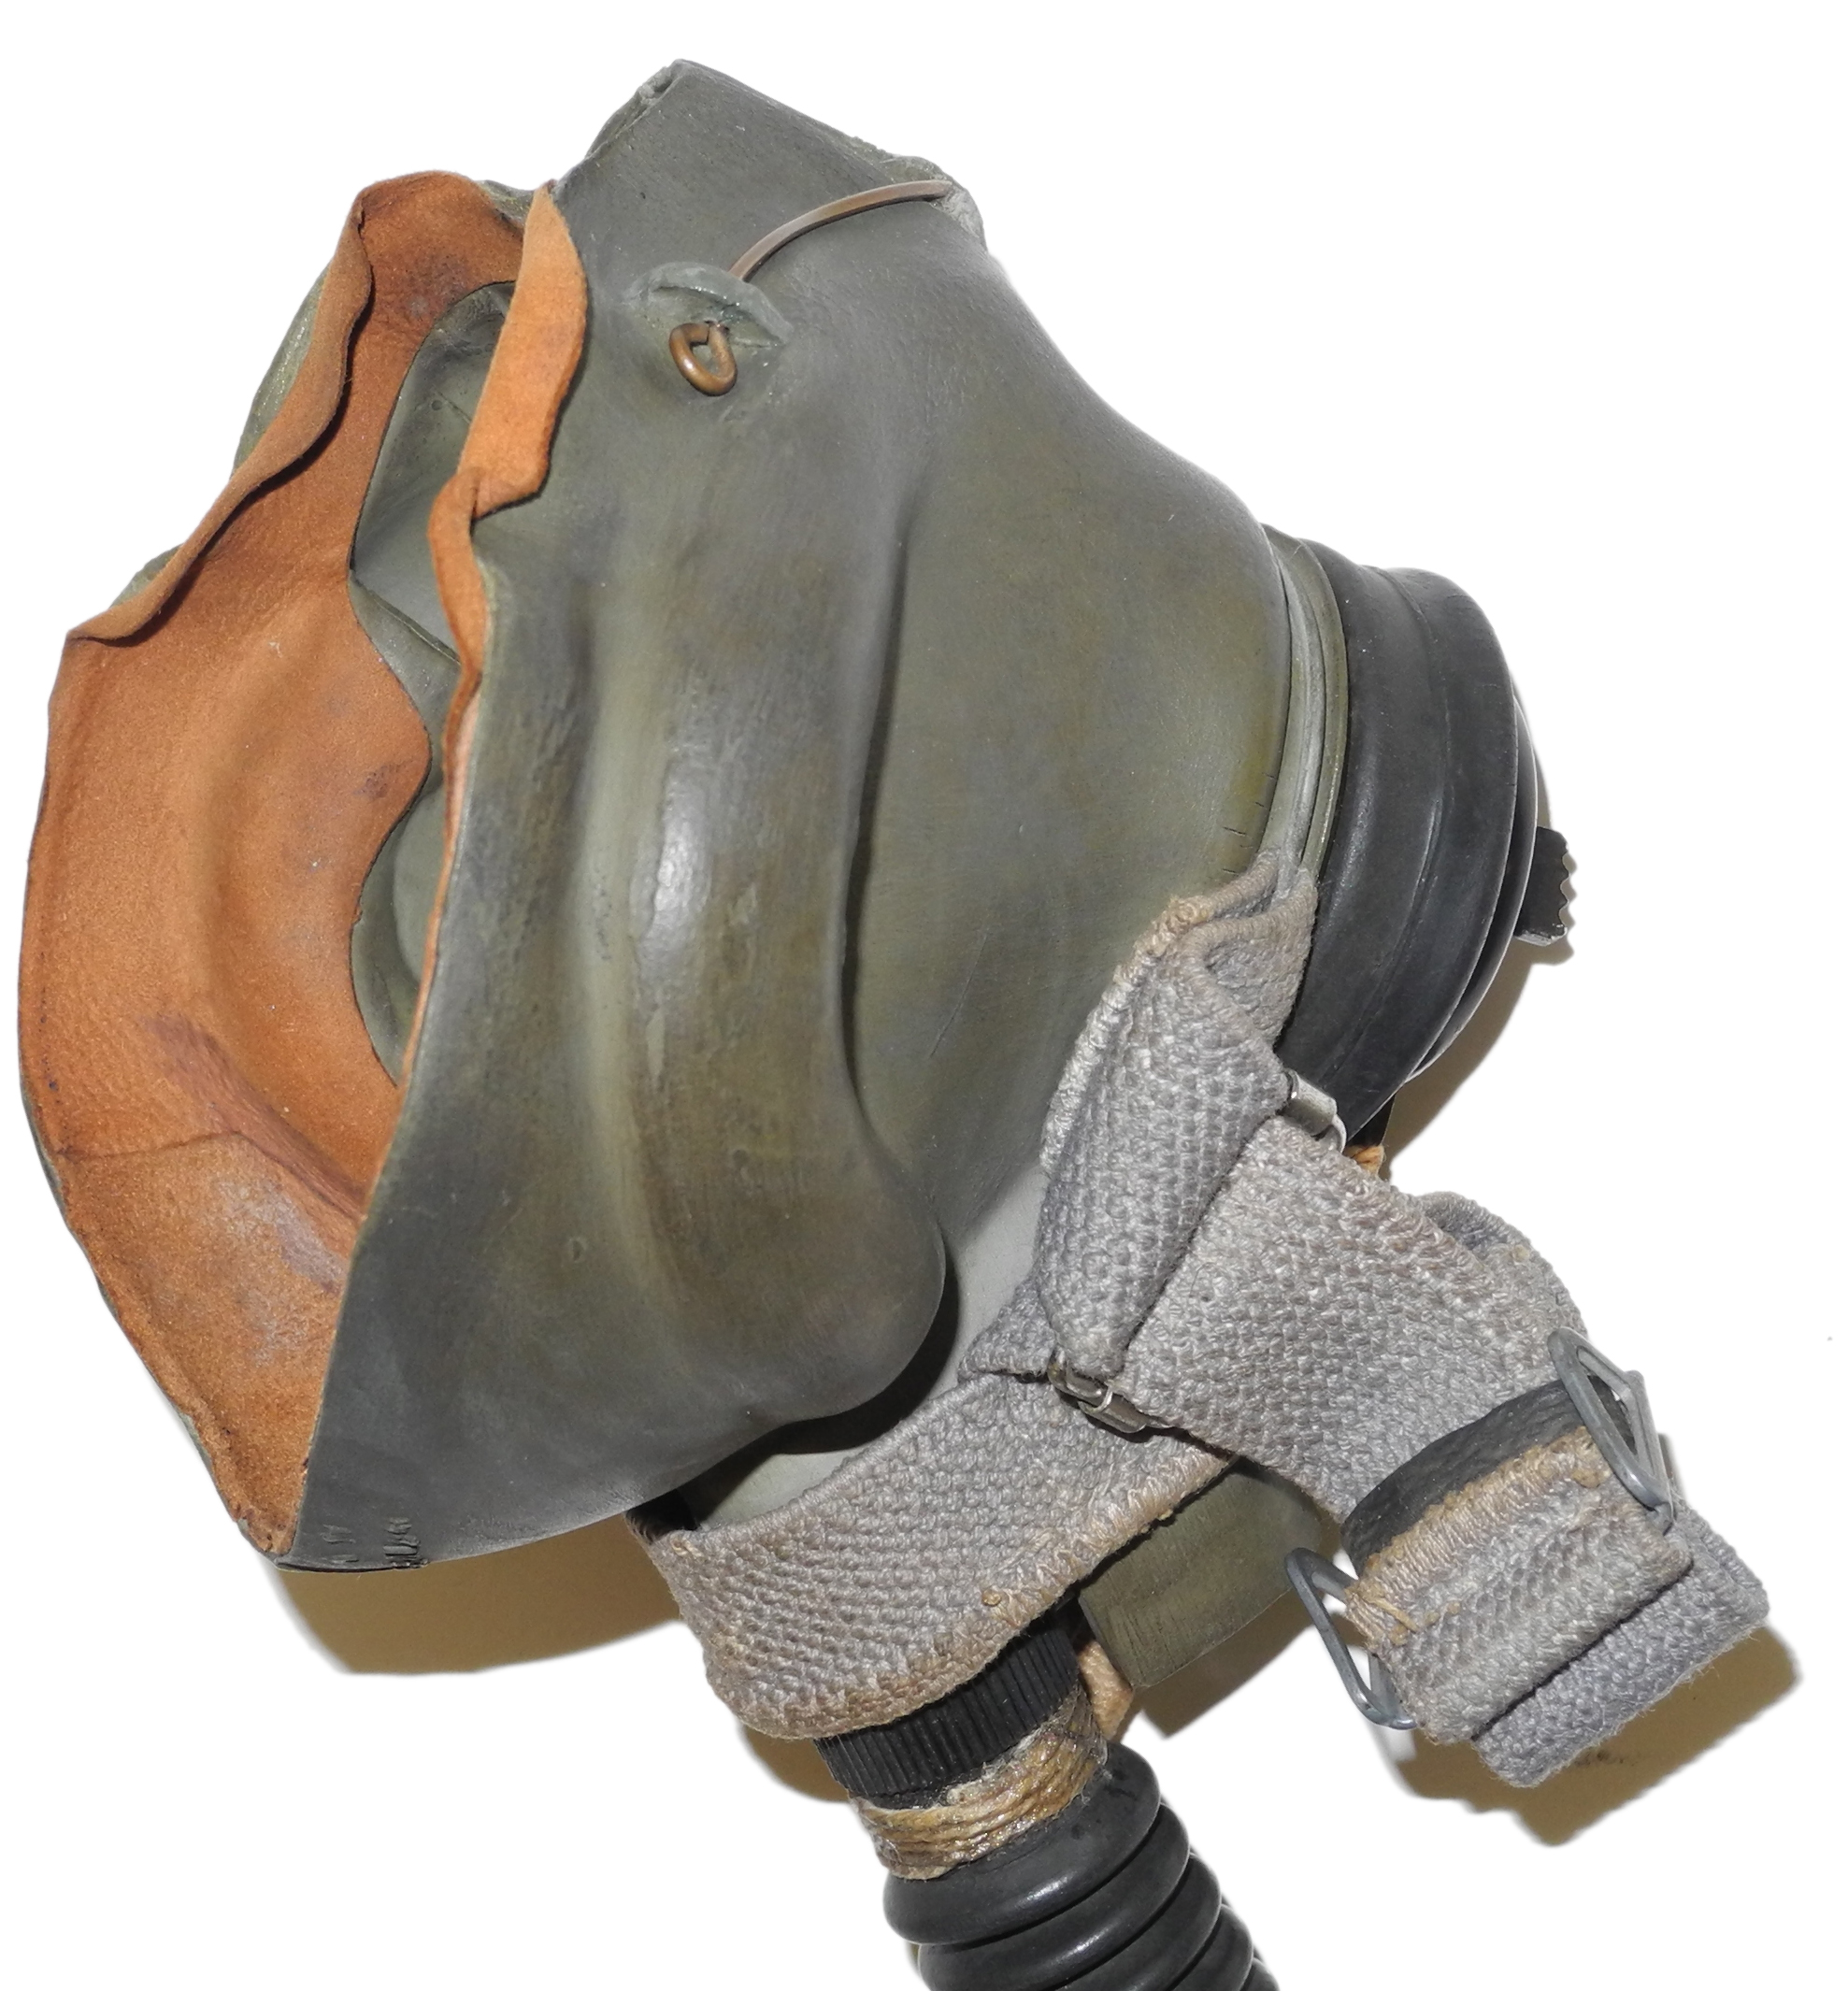 RAF G mask with narrow hose